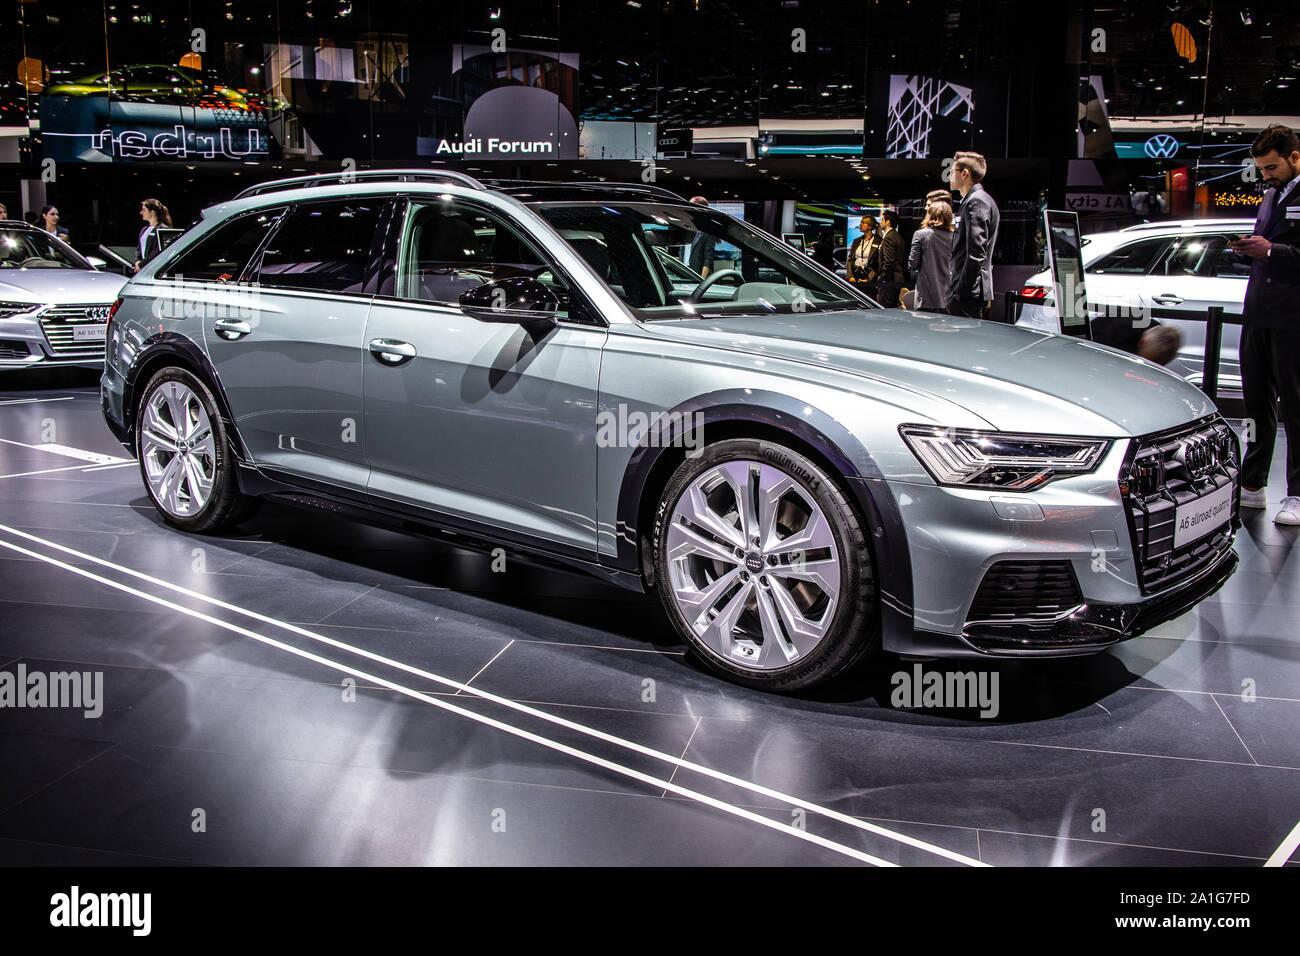 Kelebihan Audi Combi Review